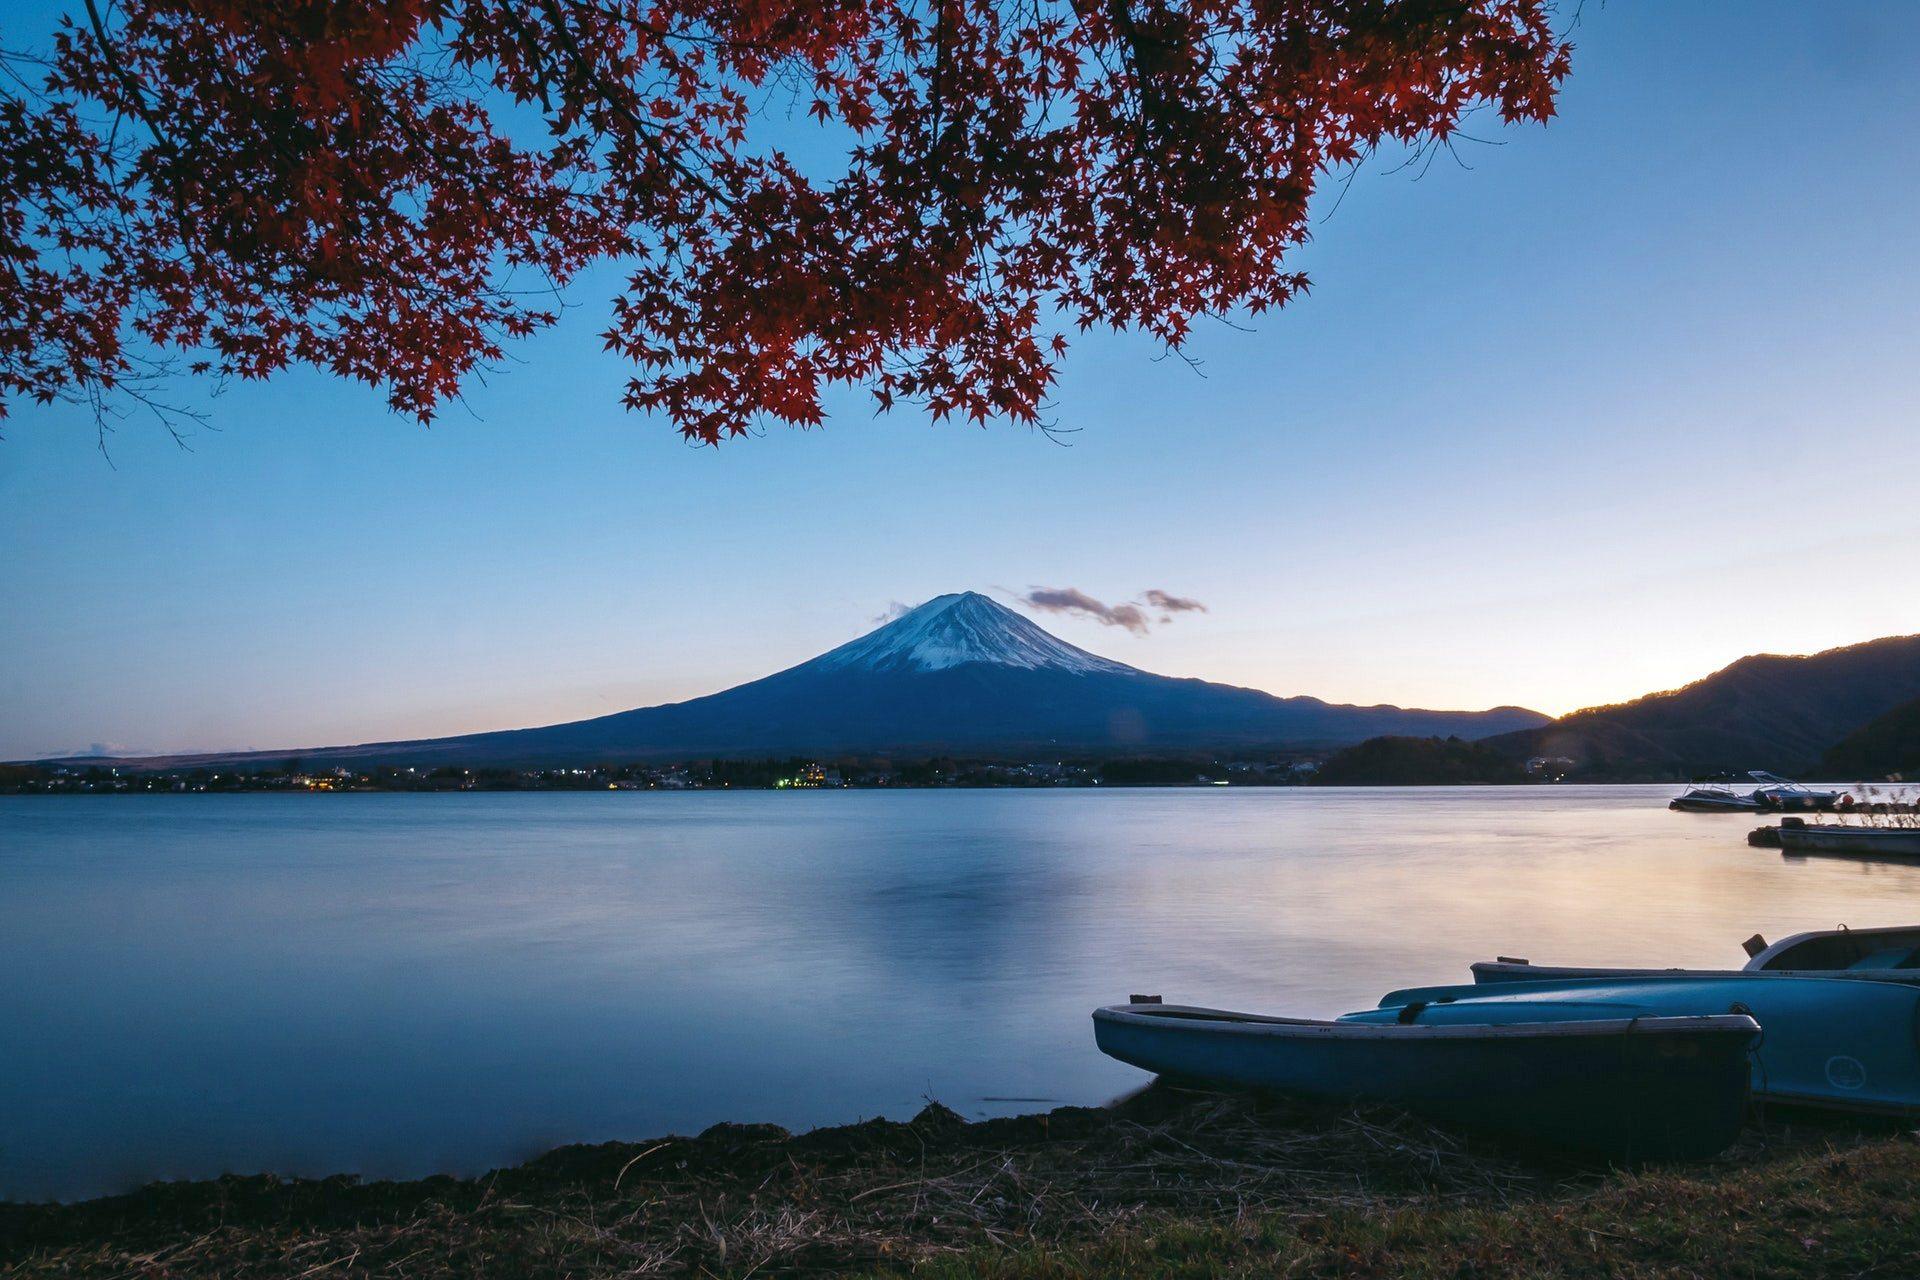 Beautiful Evening View Of Fuji Mountain Wallpaper Samsung J4 Plus Duvar Kagitlari 1920x1280 Wallpaper Teahub Io